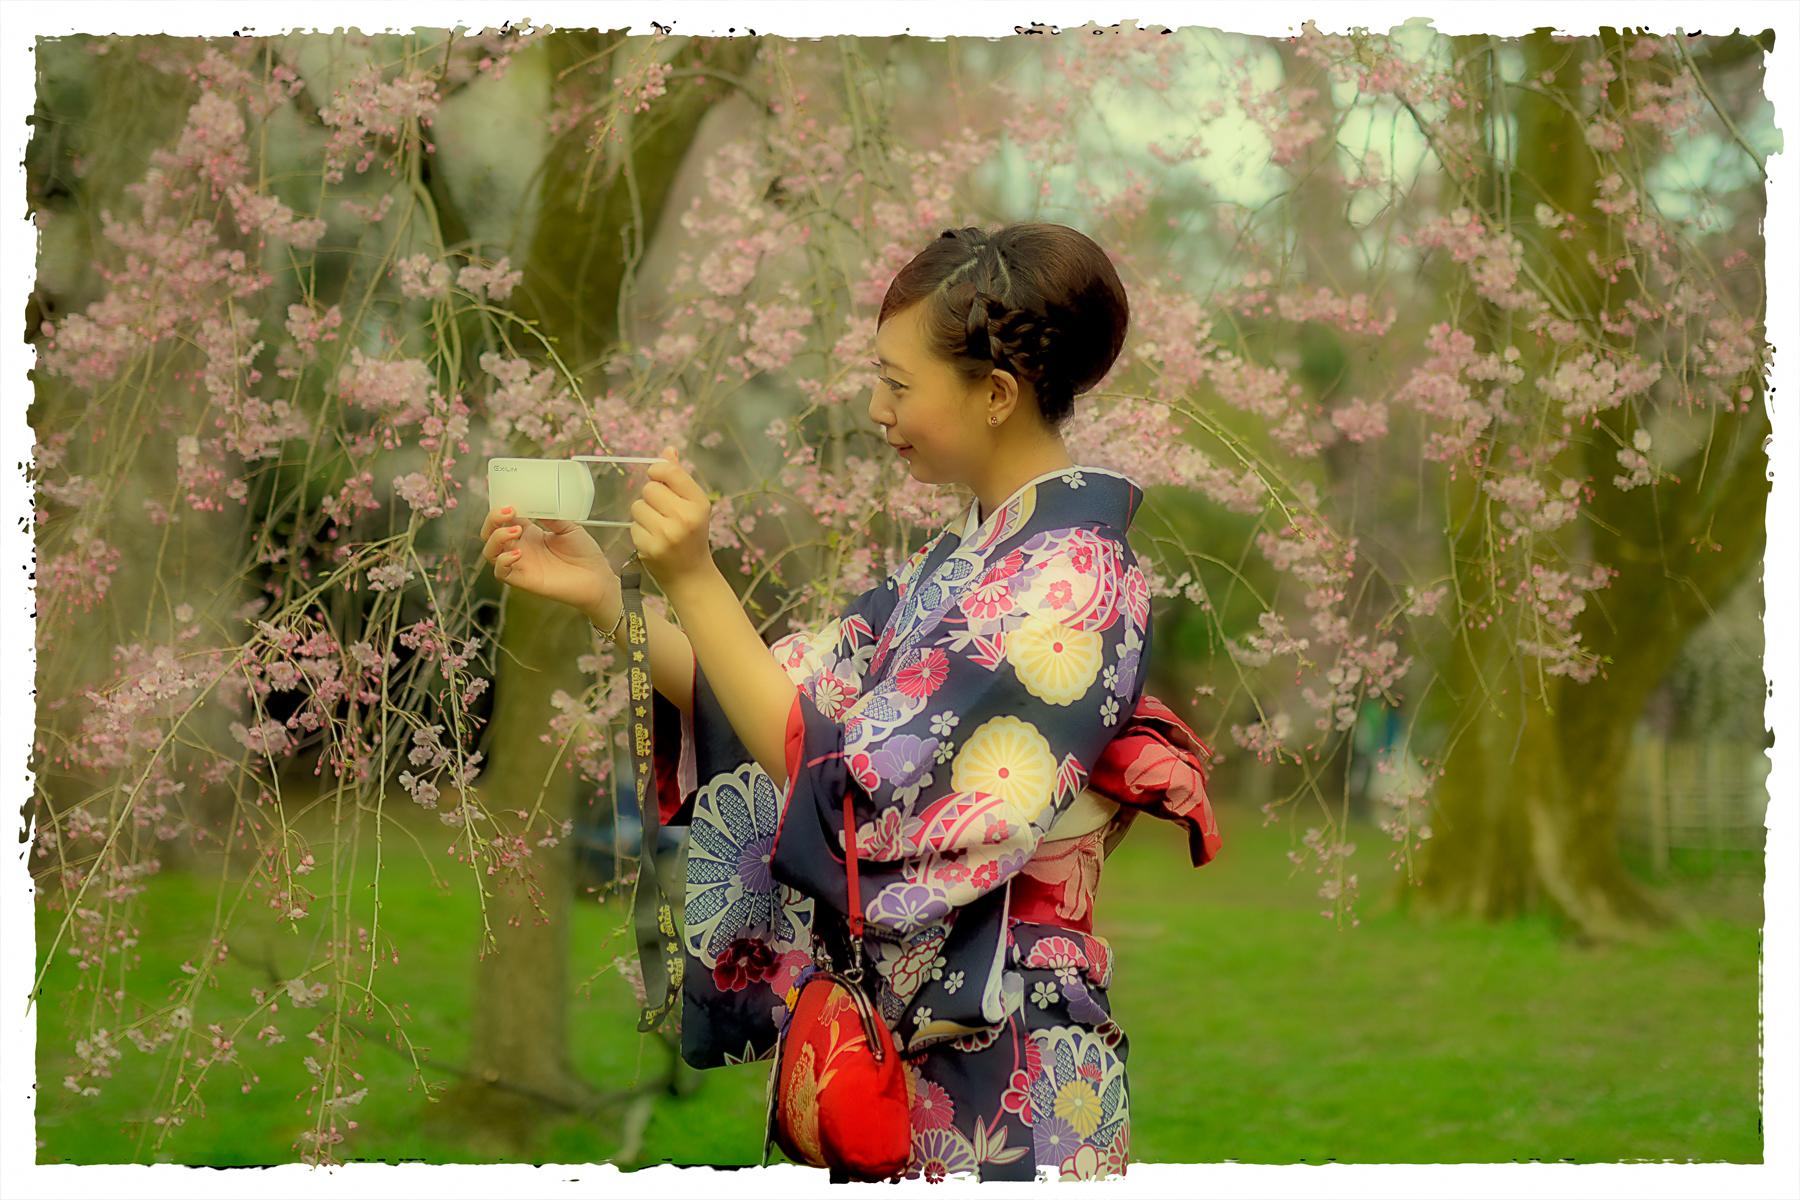 A Selfie with the Sakura by kxl in Regular Member Gallery